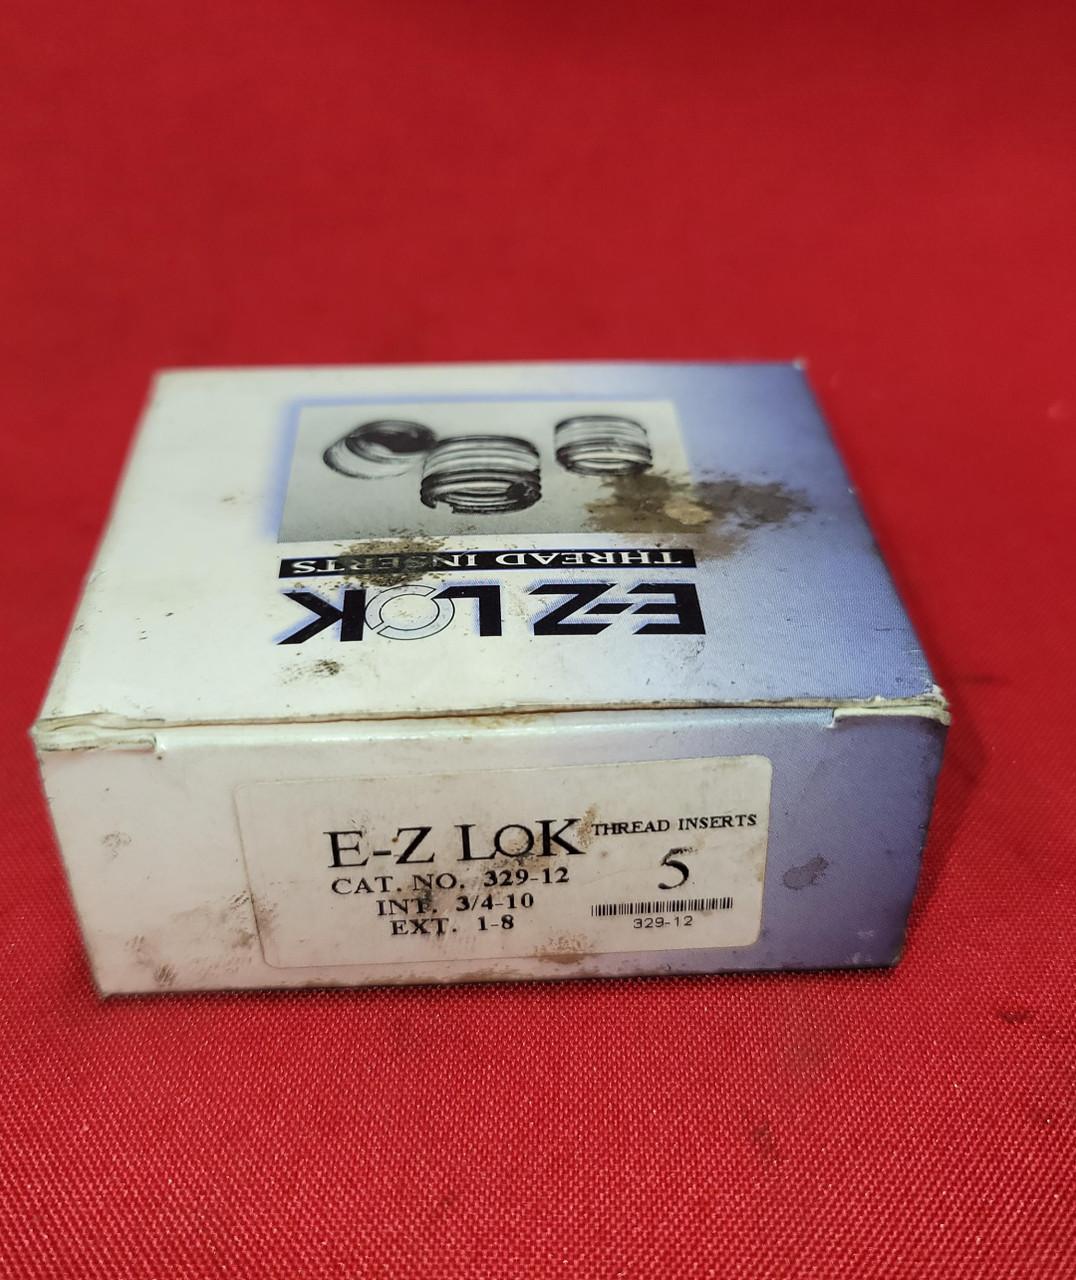 E-Z Lok 329-12 Thread Inserts Box of 5